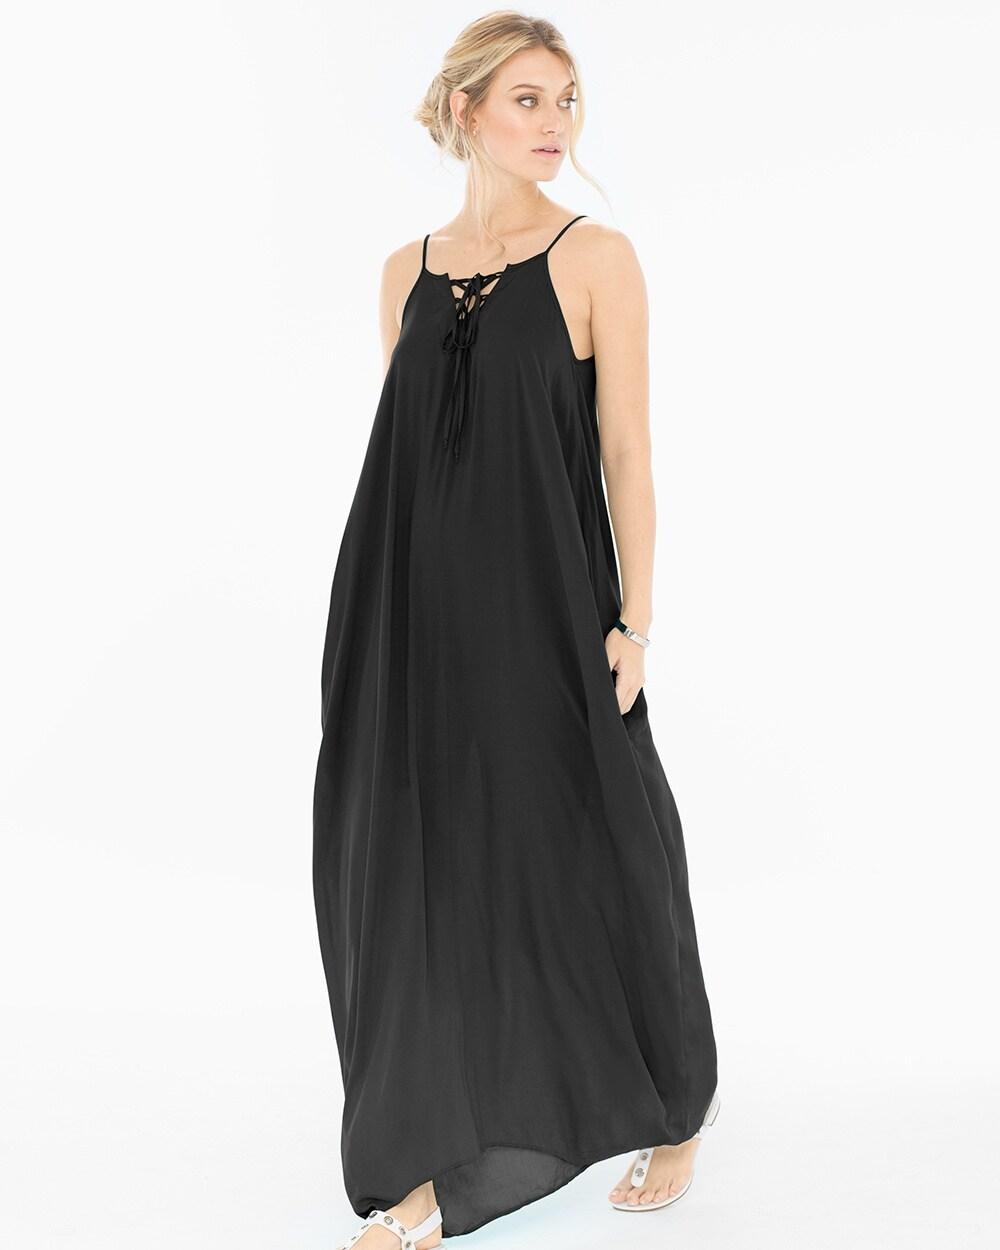 b3ac4620216 Lace Up Neck Cover Up Maxi Dress Black - Soma